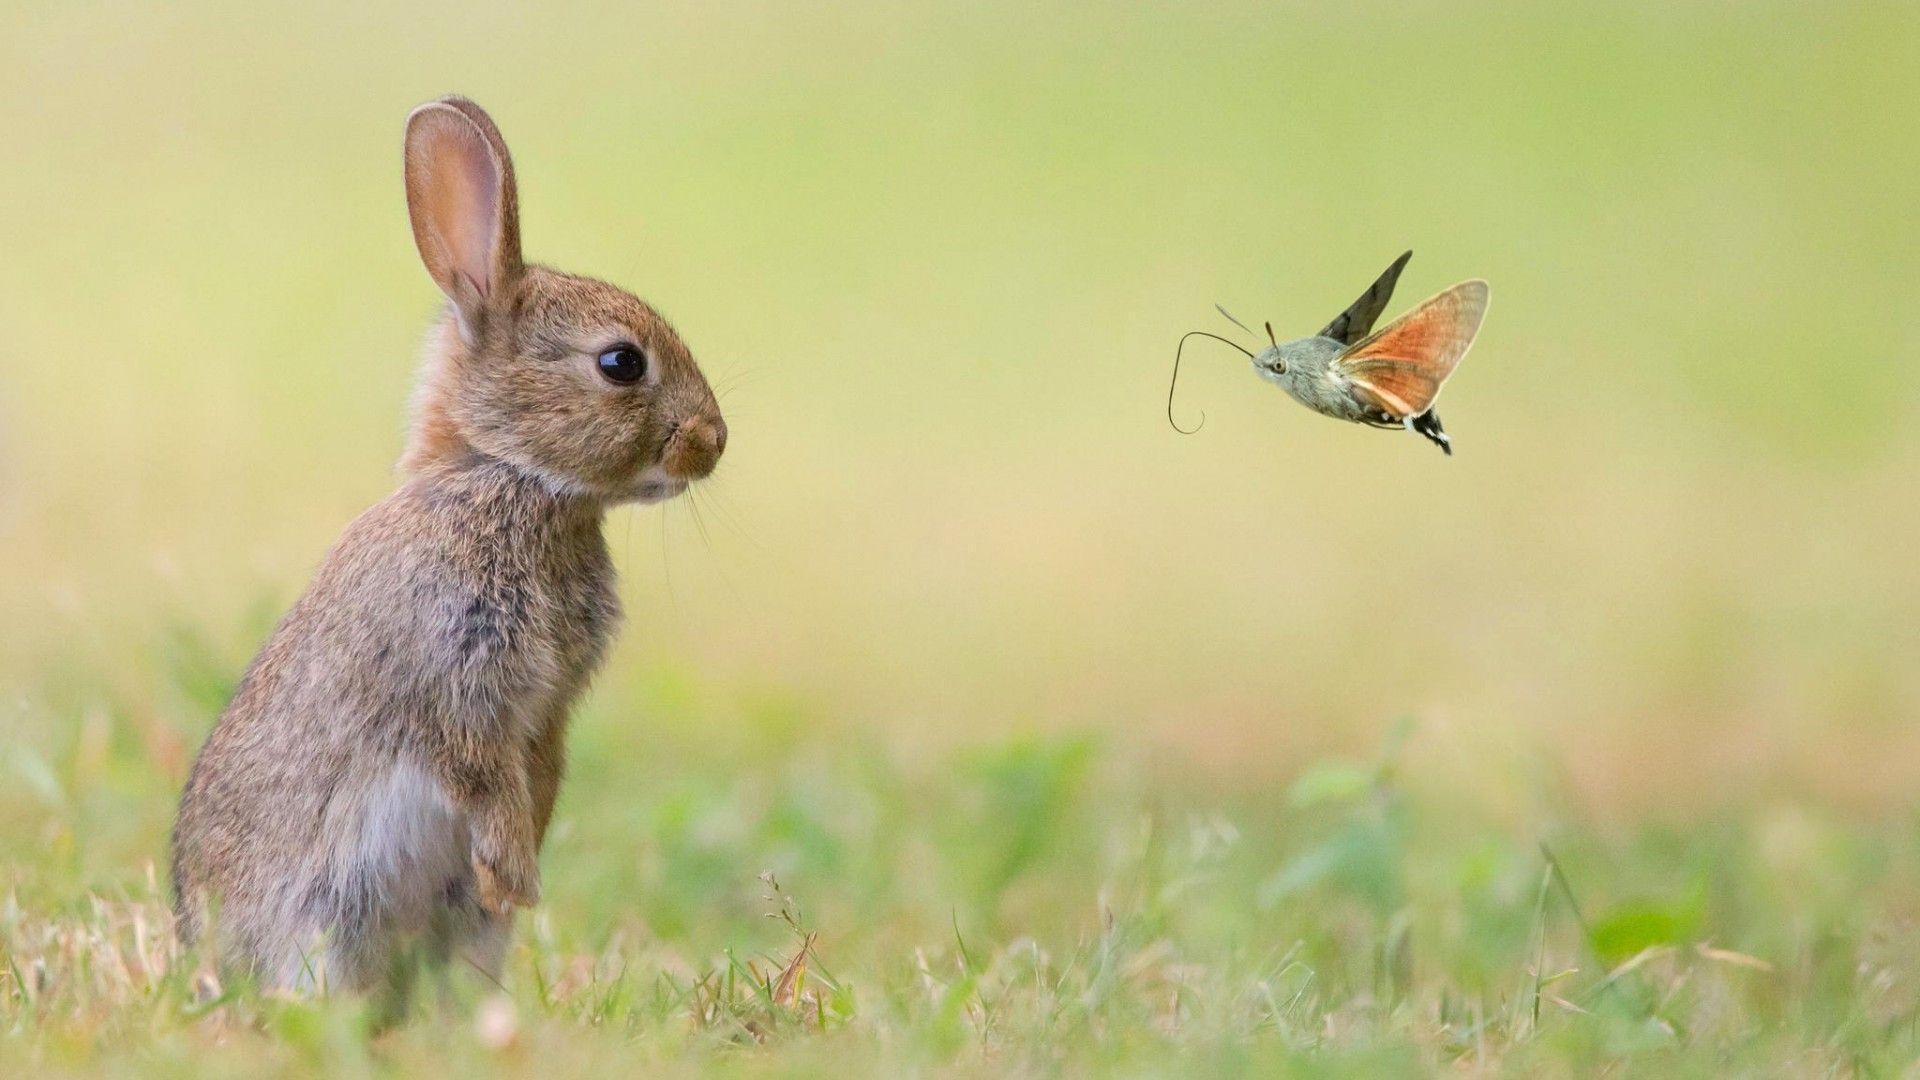 pic of rabbit hd